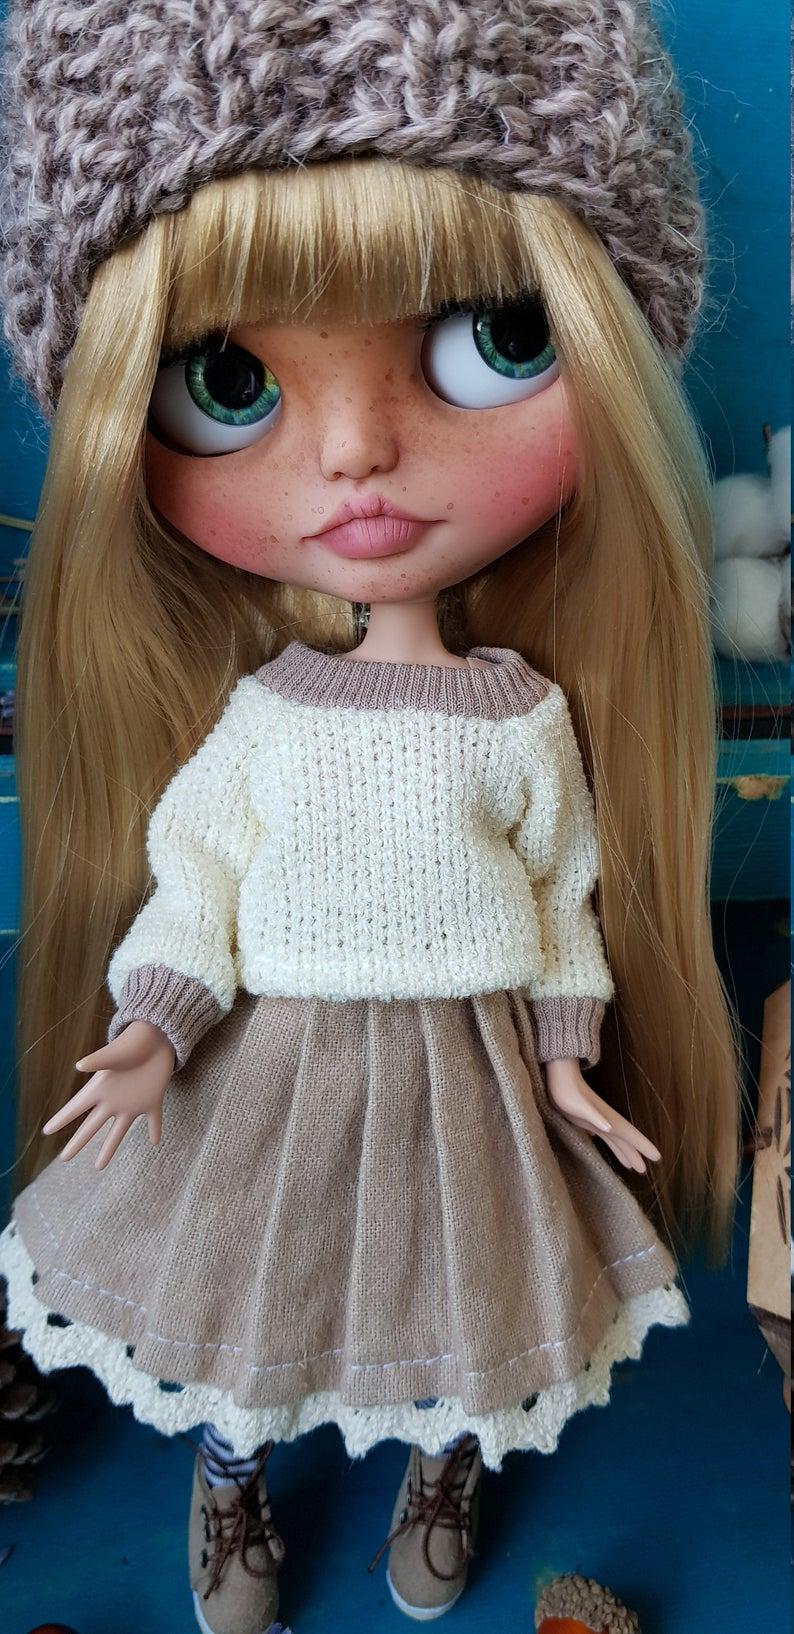 Christine - Custom Blythe Doll One-Of-A-Kind OOAK Custom Blythe Doll ⭐